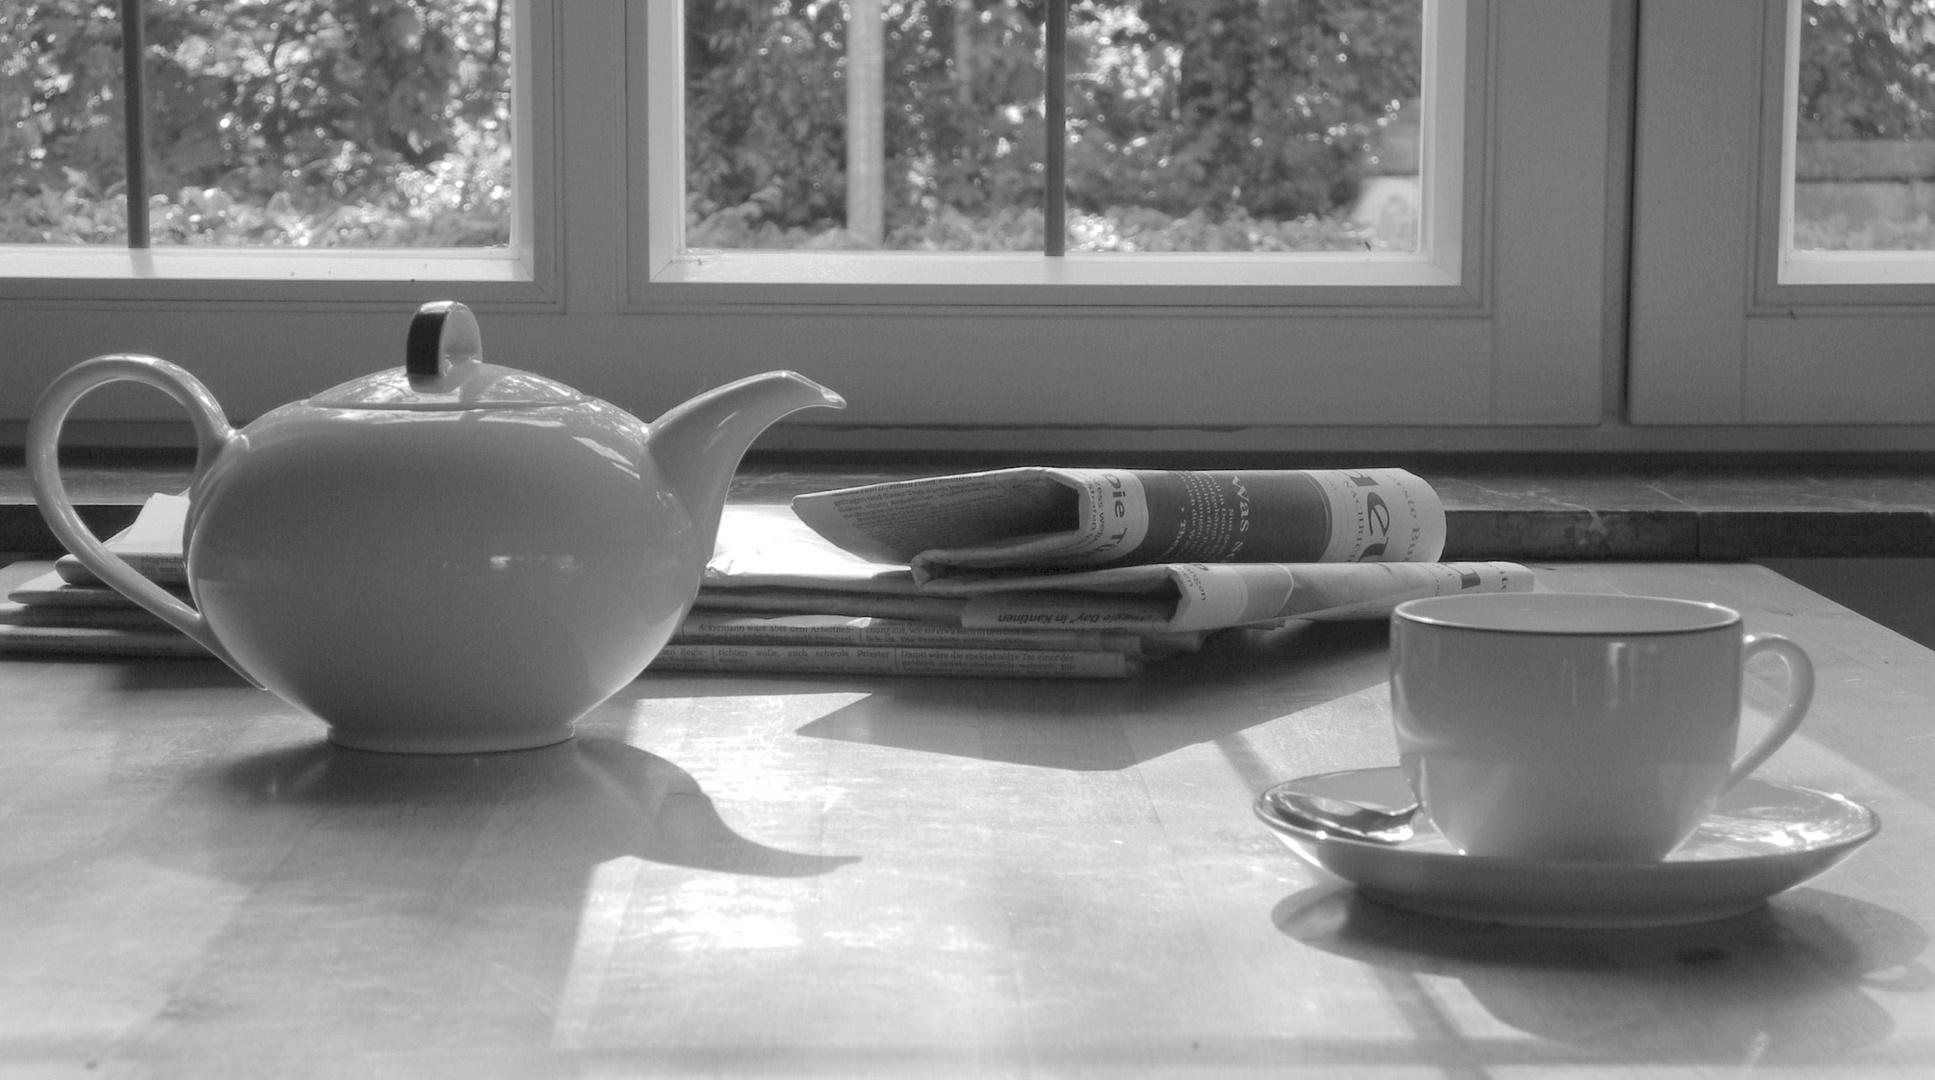 Blick nach dem Frühstück I